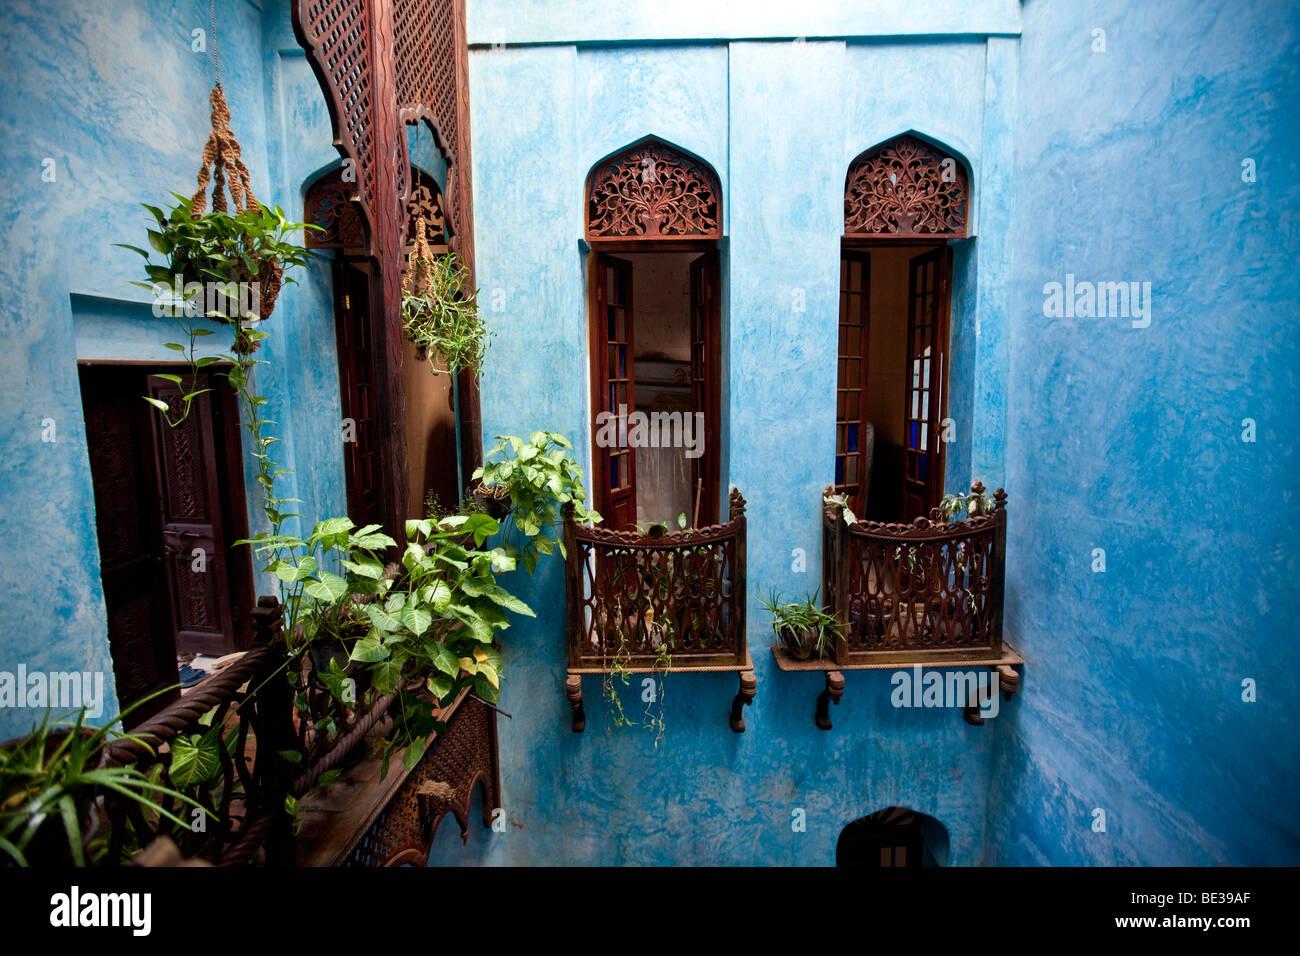 The Emerson Spice Hotel, Stonetown, Stone Town, Zanzibar, Tanzania, Africa - Stock Image